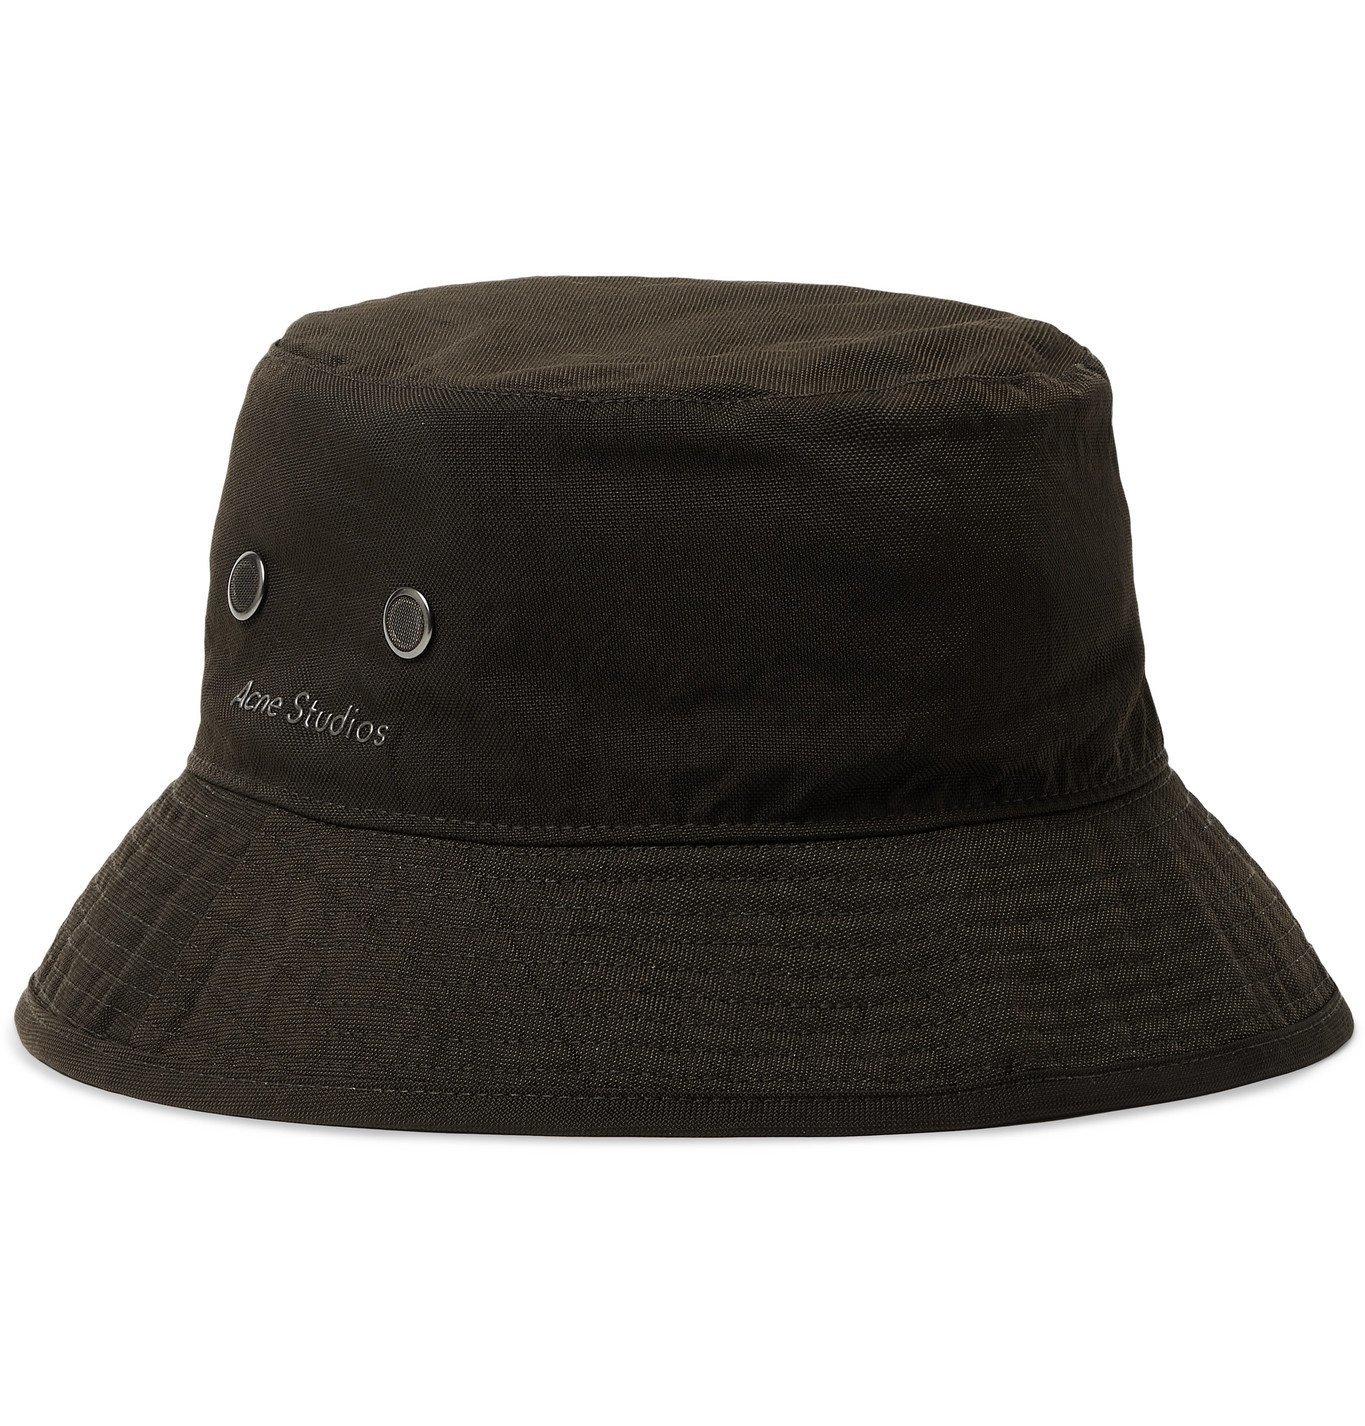 ACNE STUDIOS - Logo-Appliquéd Nylon Bucket Hat - Green